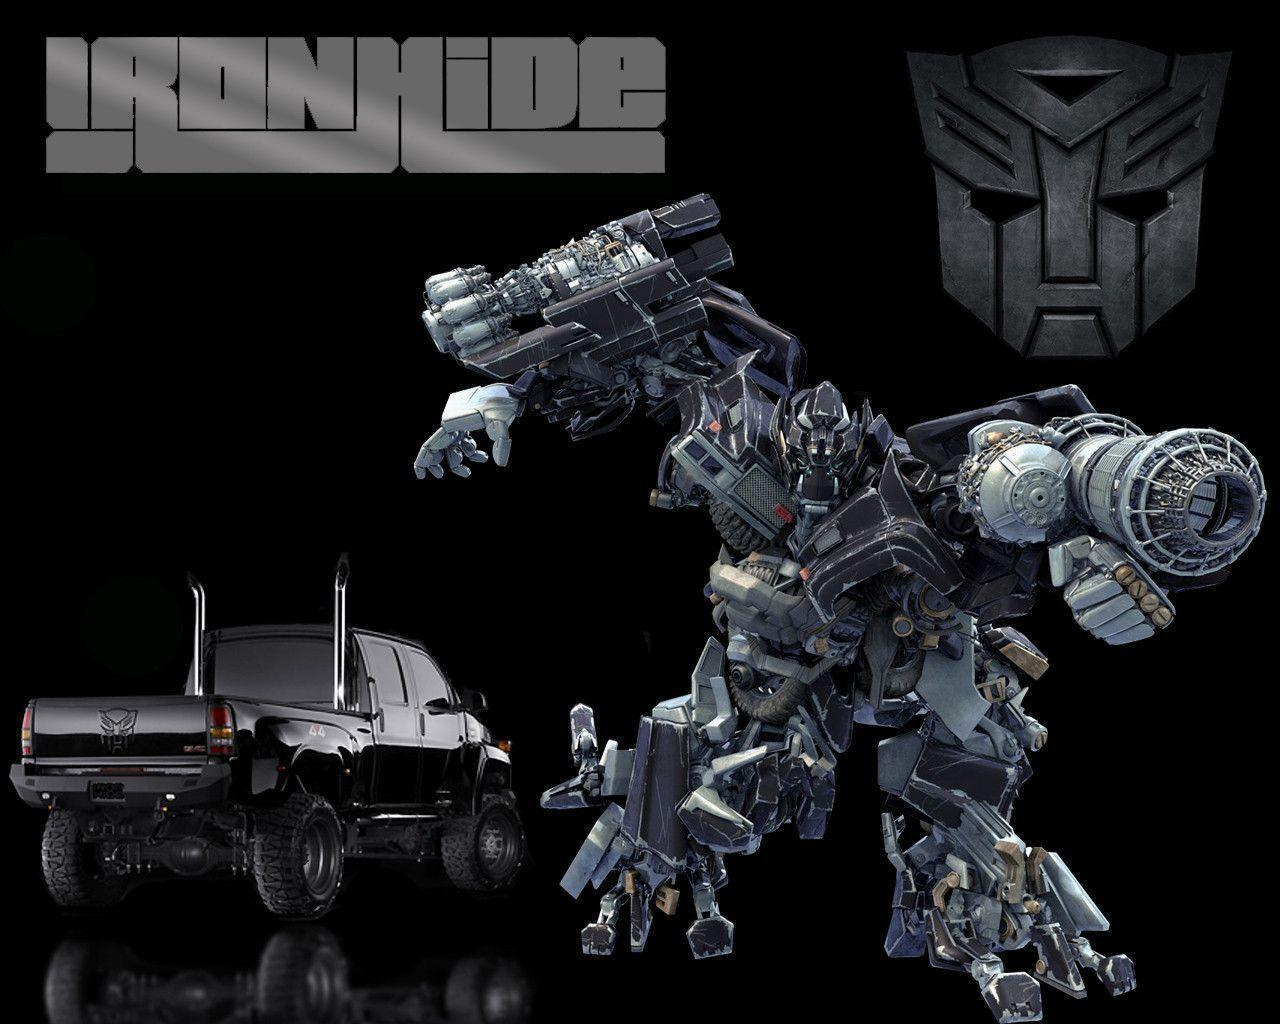 Transformers Ironhide Wallpapers Wallpaper Cave